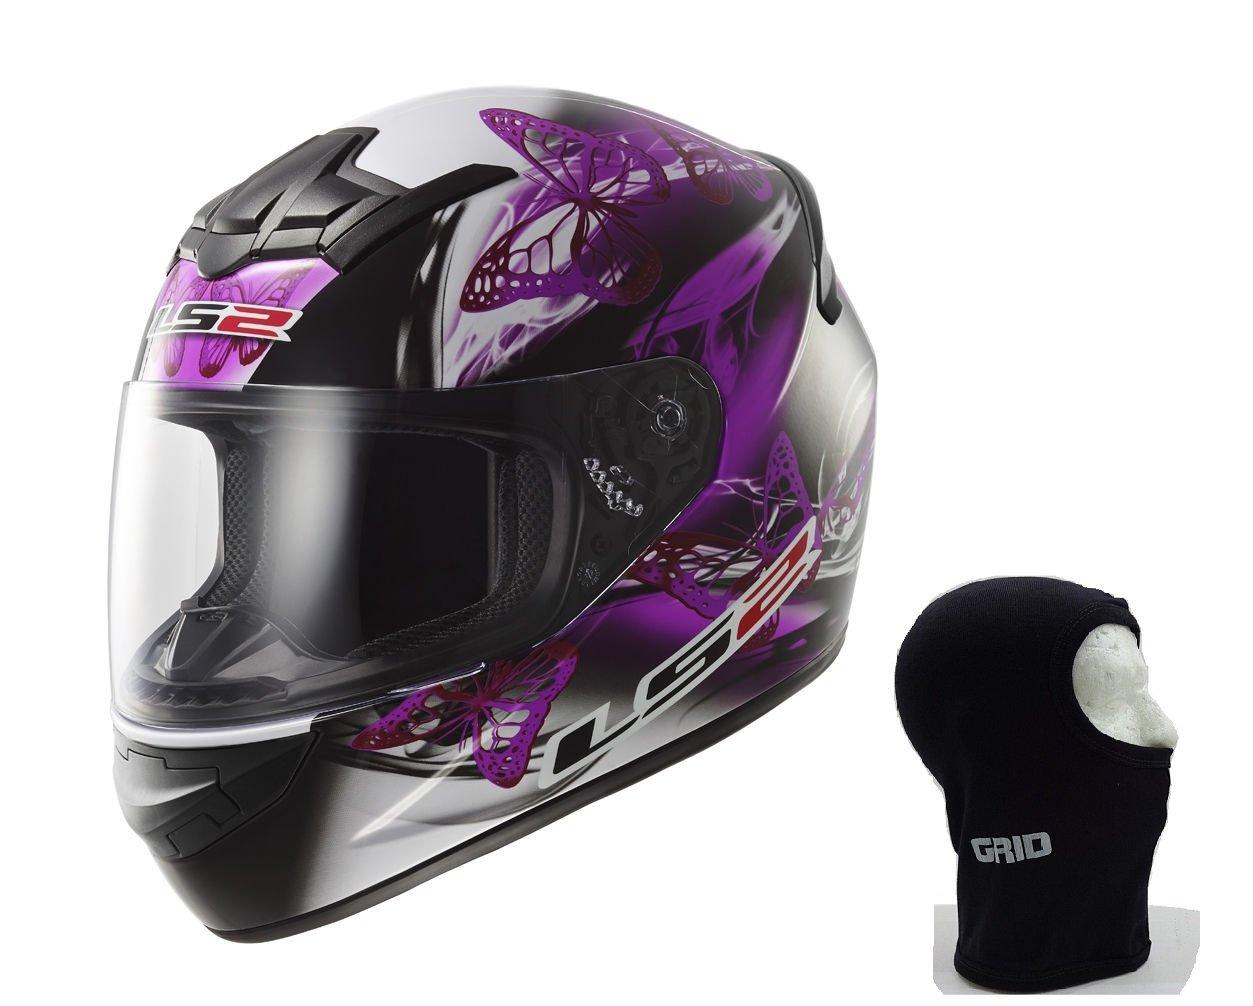 Motorcycle Helmet LS2 FF352 Flutter Rookie Helmet Lady 2 Colours + Balaclava LS2 FF352 ROOKIE